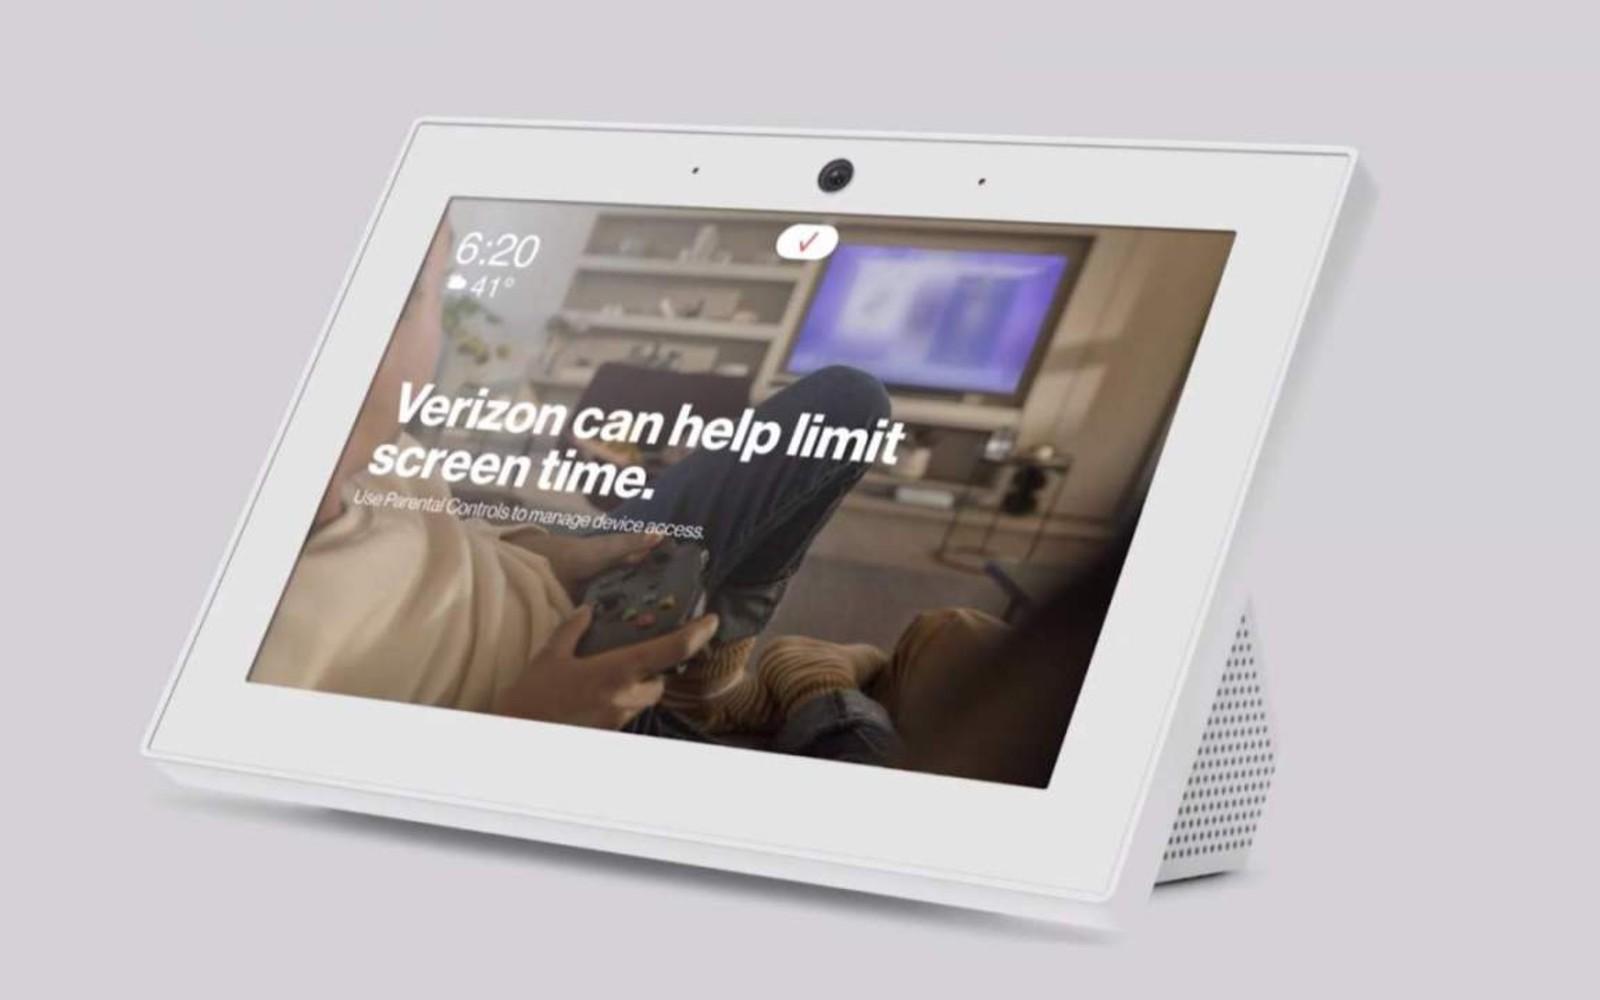 Verizon's Smart Display includes LTE in case of Fios interruptions